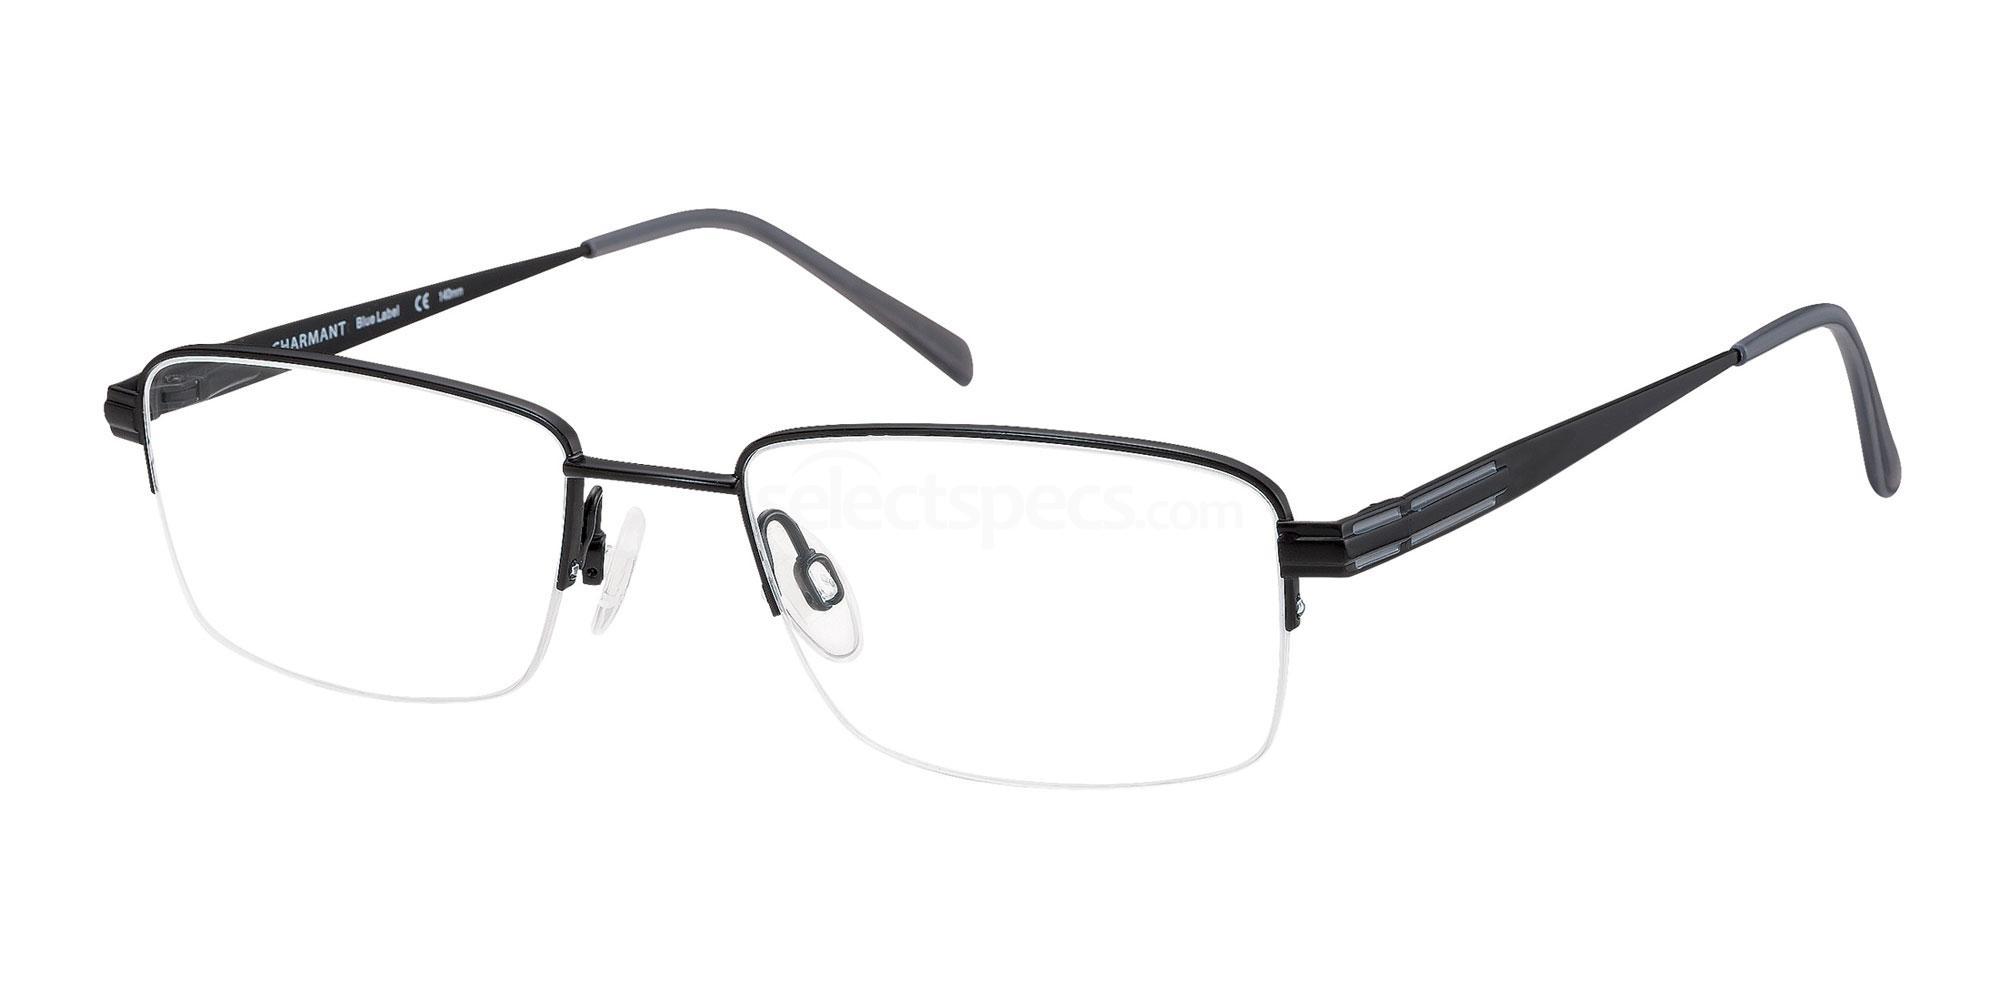 BK CH16113 Glasses, Charmant Blue Label